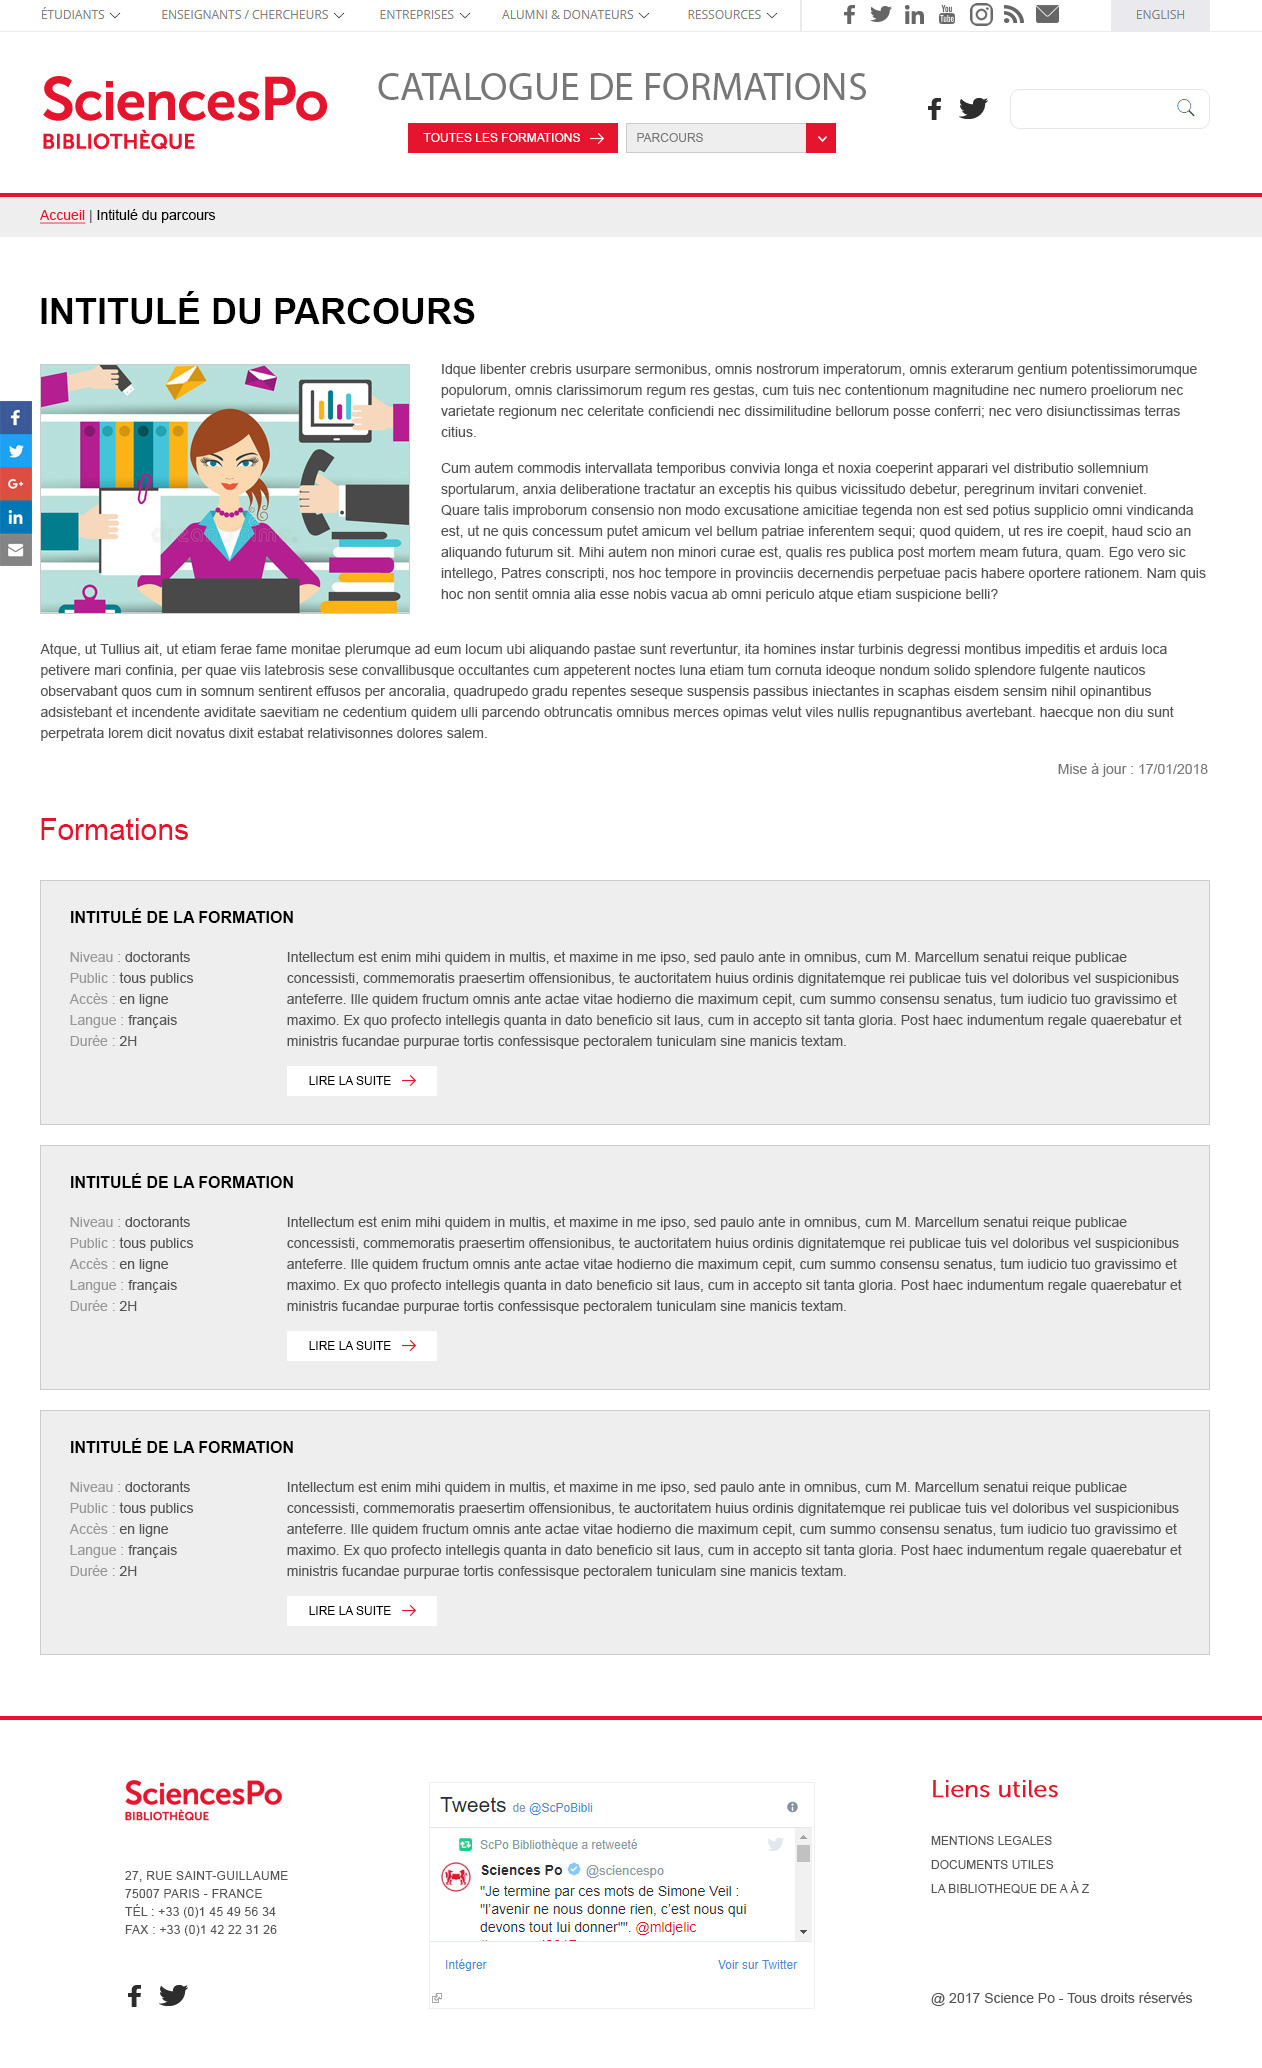 sciencespo-bibliotheque-2